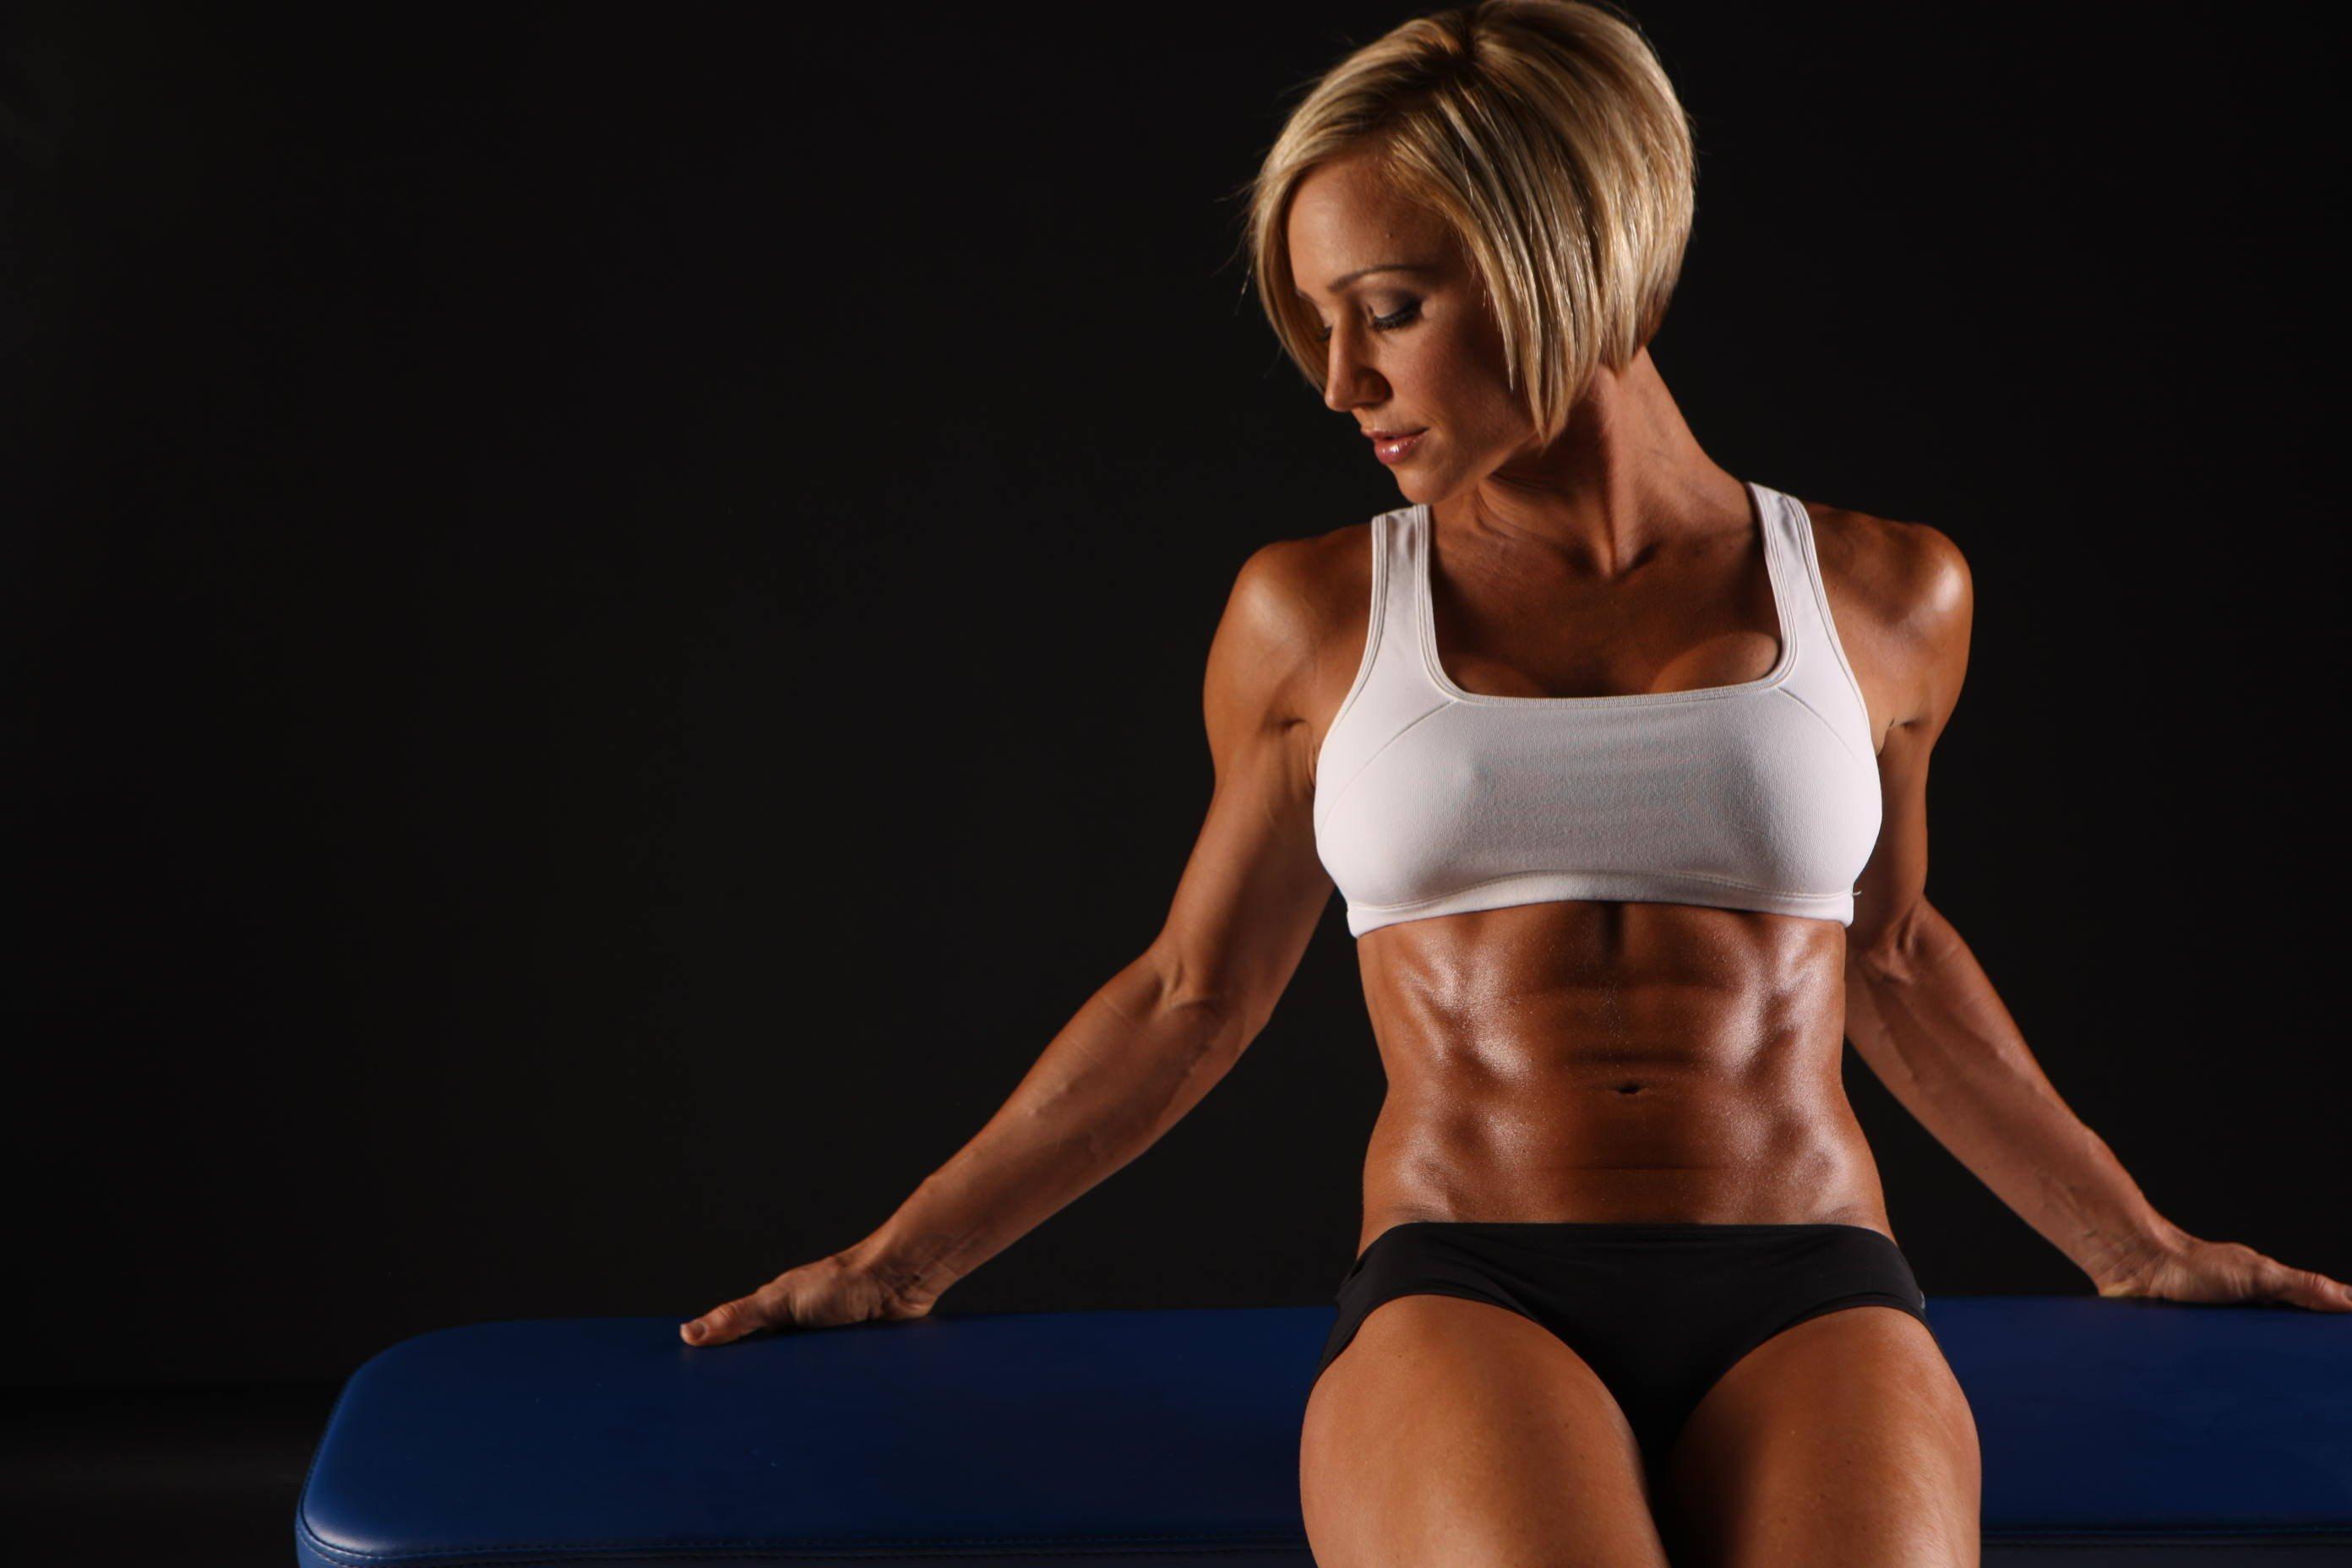 Athletic Women - WallDevil